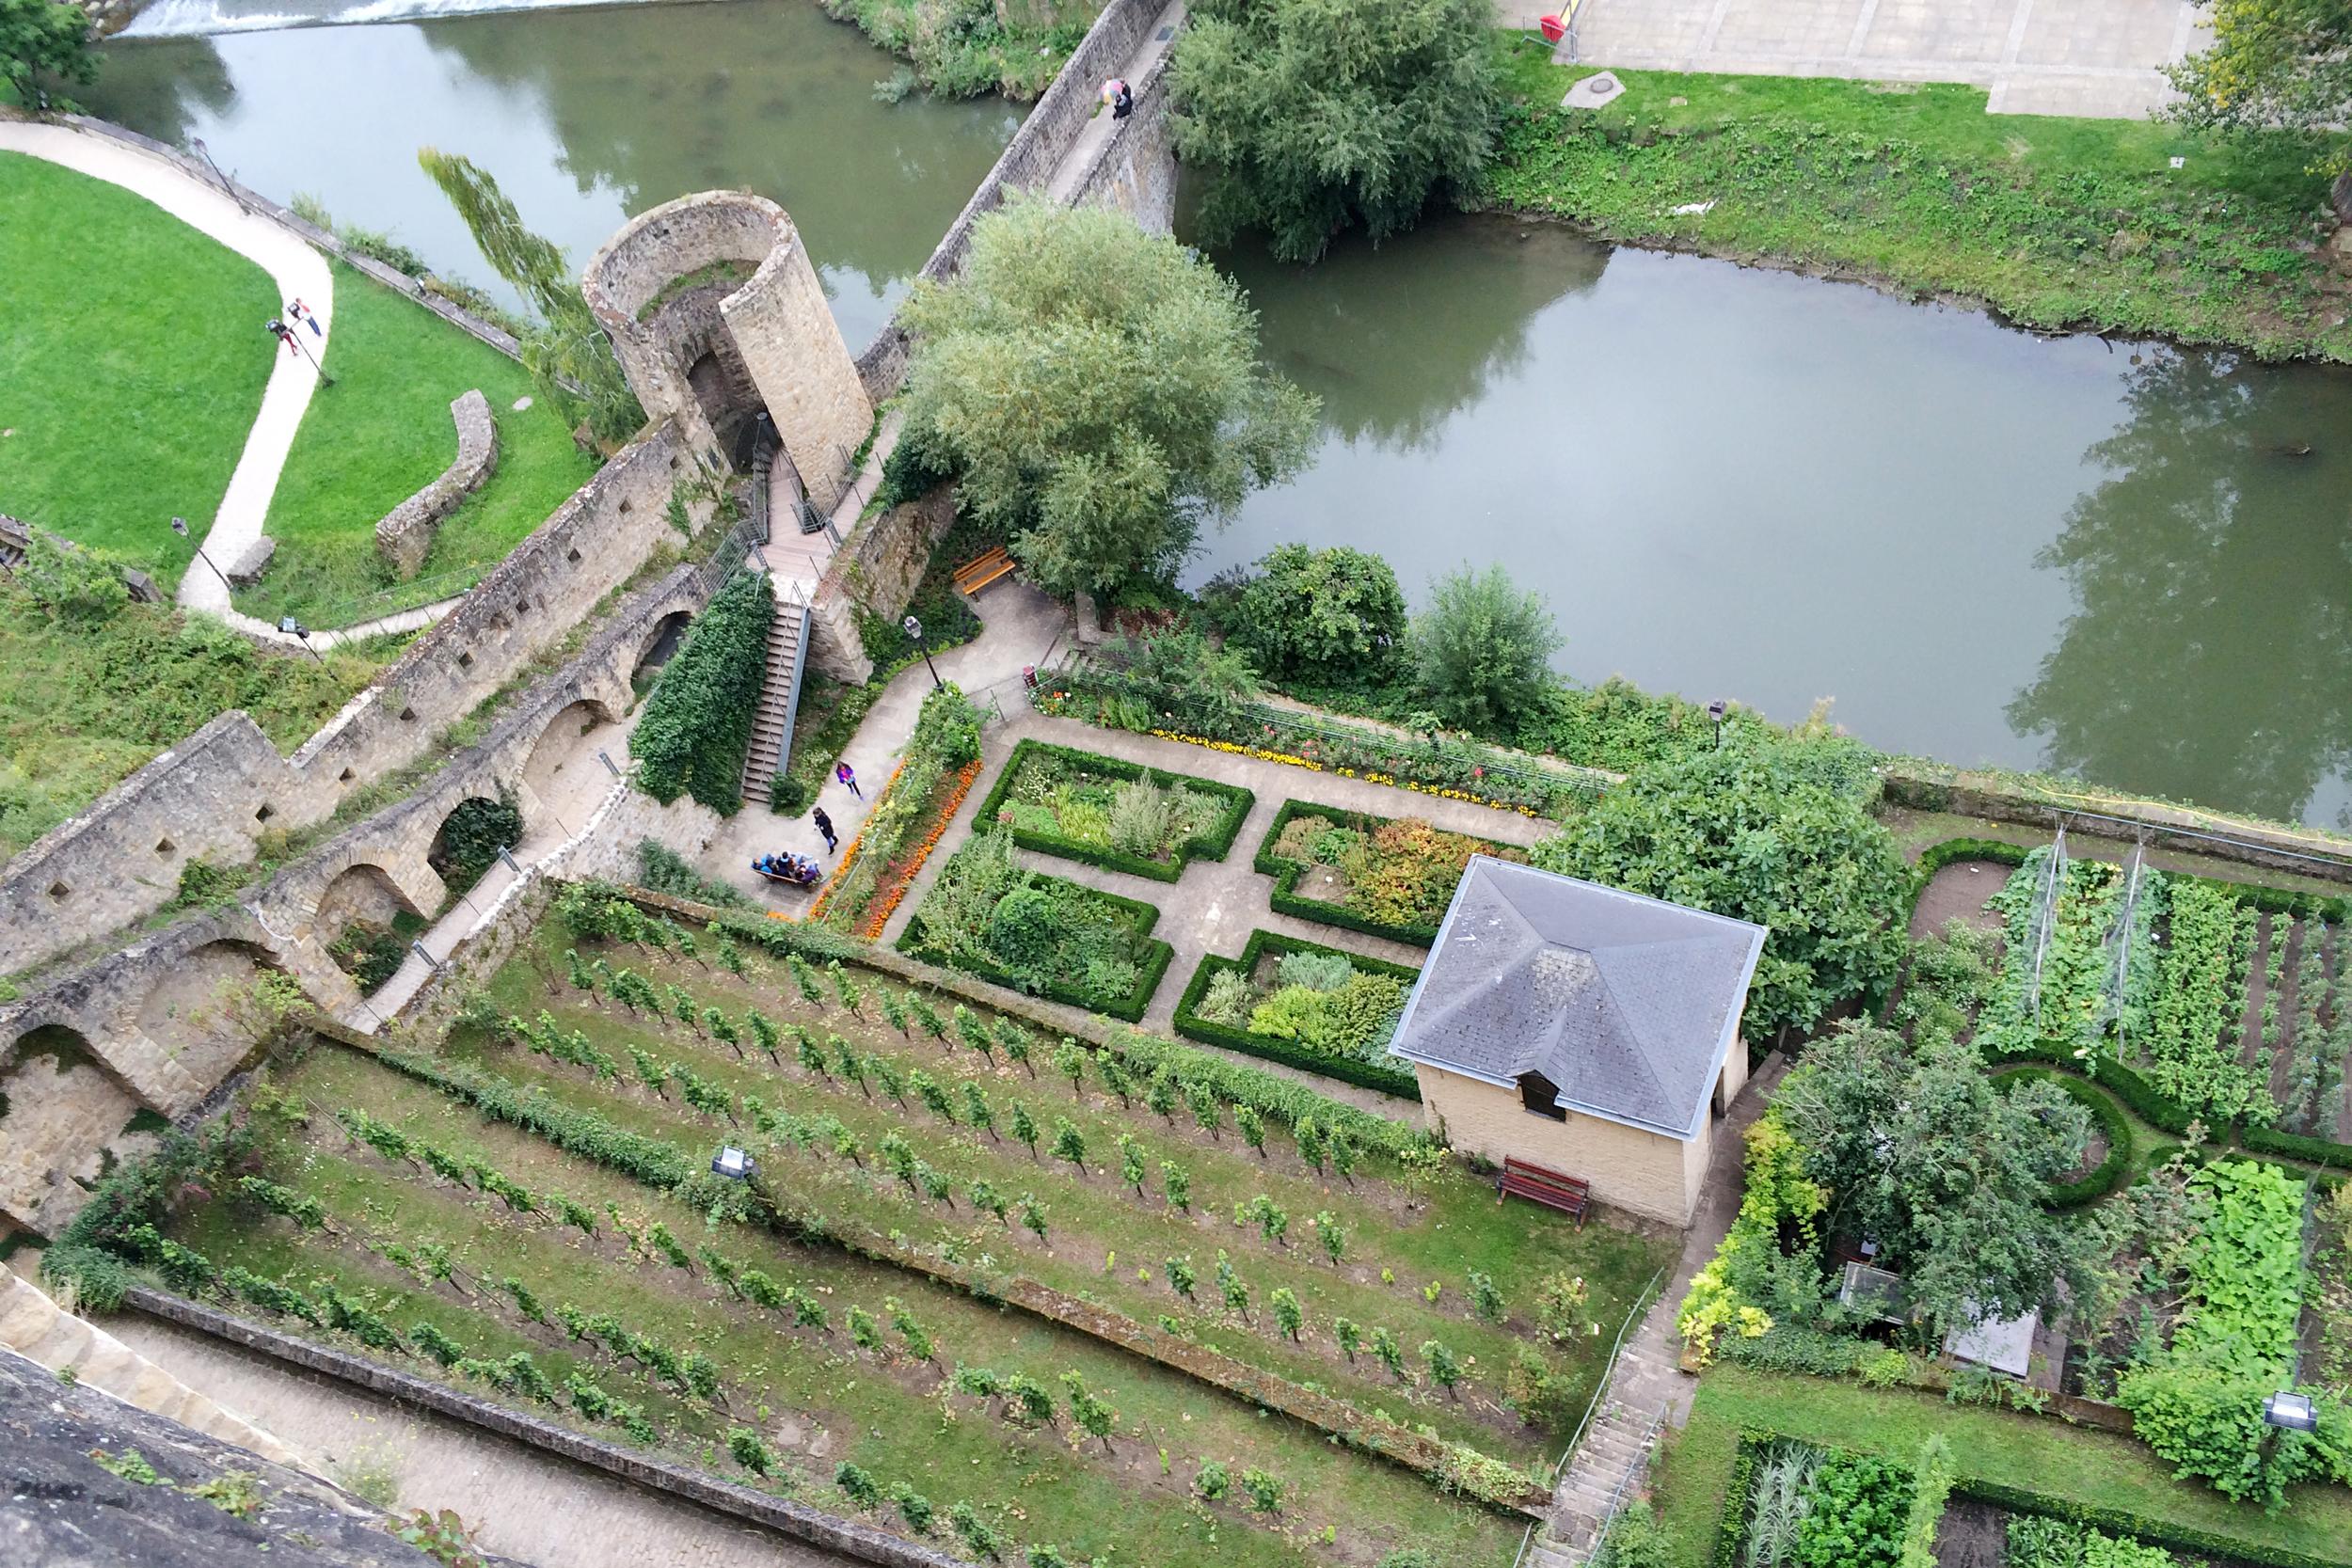 Aren't these gardens lovely?